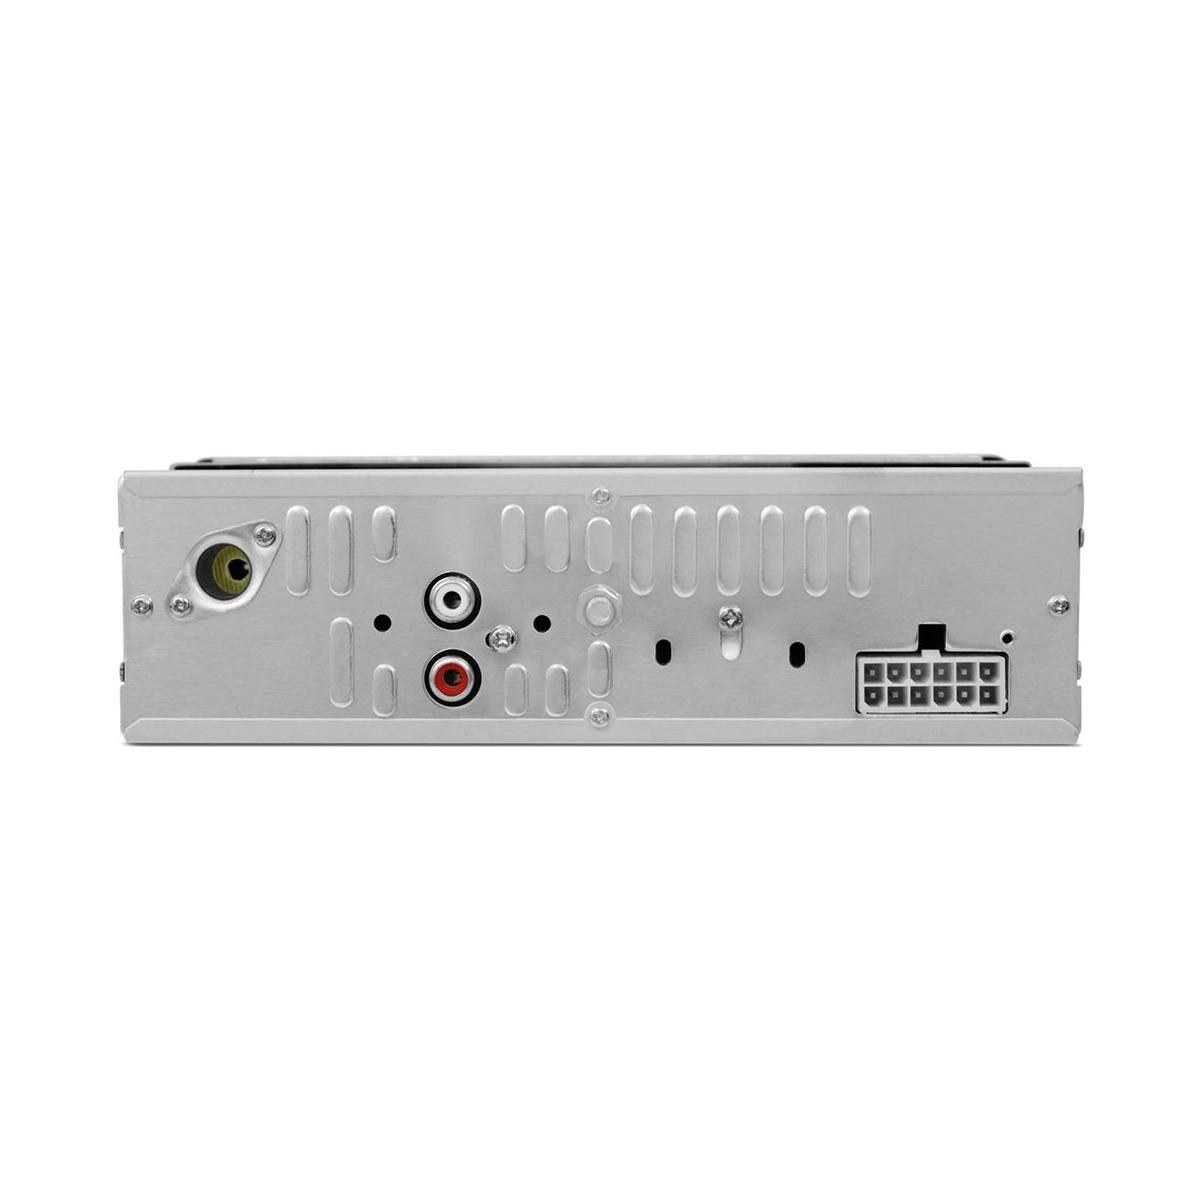 mp3-automotivo-carro-som-com-usb-visor-lcd-controle-remoto-D_NQ_NP_730715-MLB25270667398_012017-F.jpg